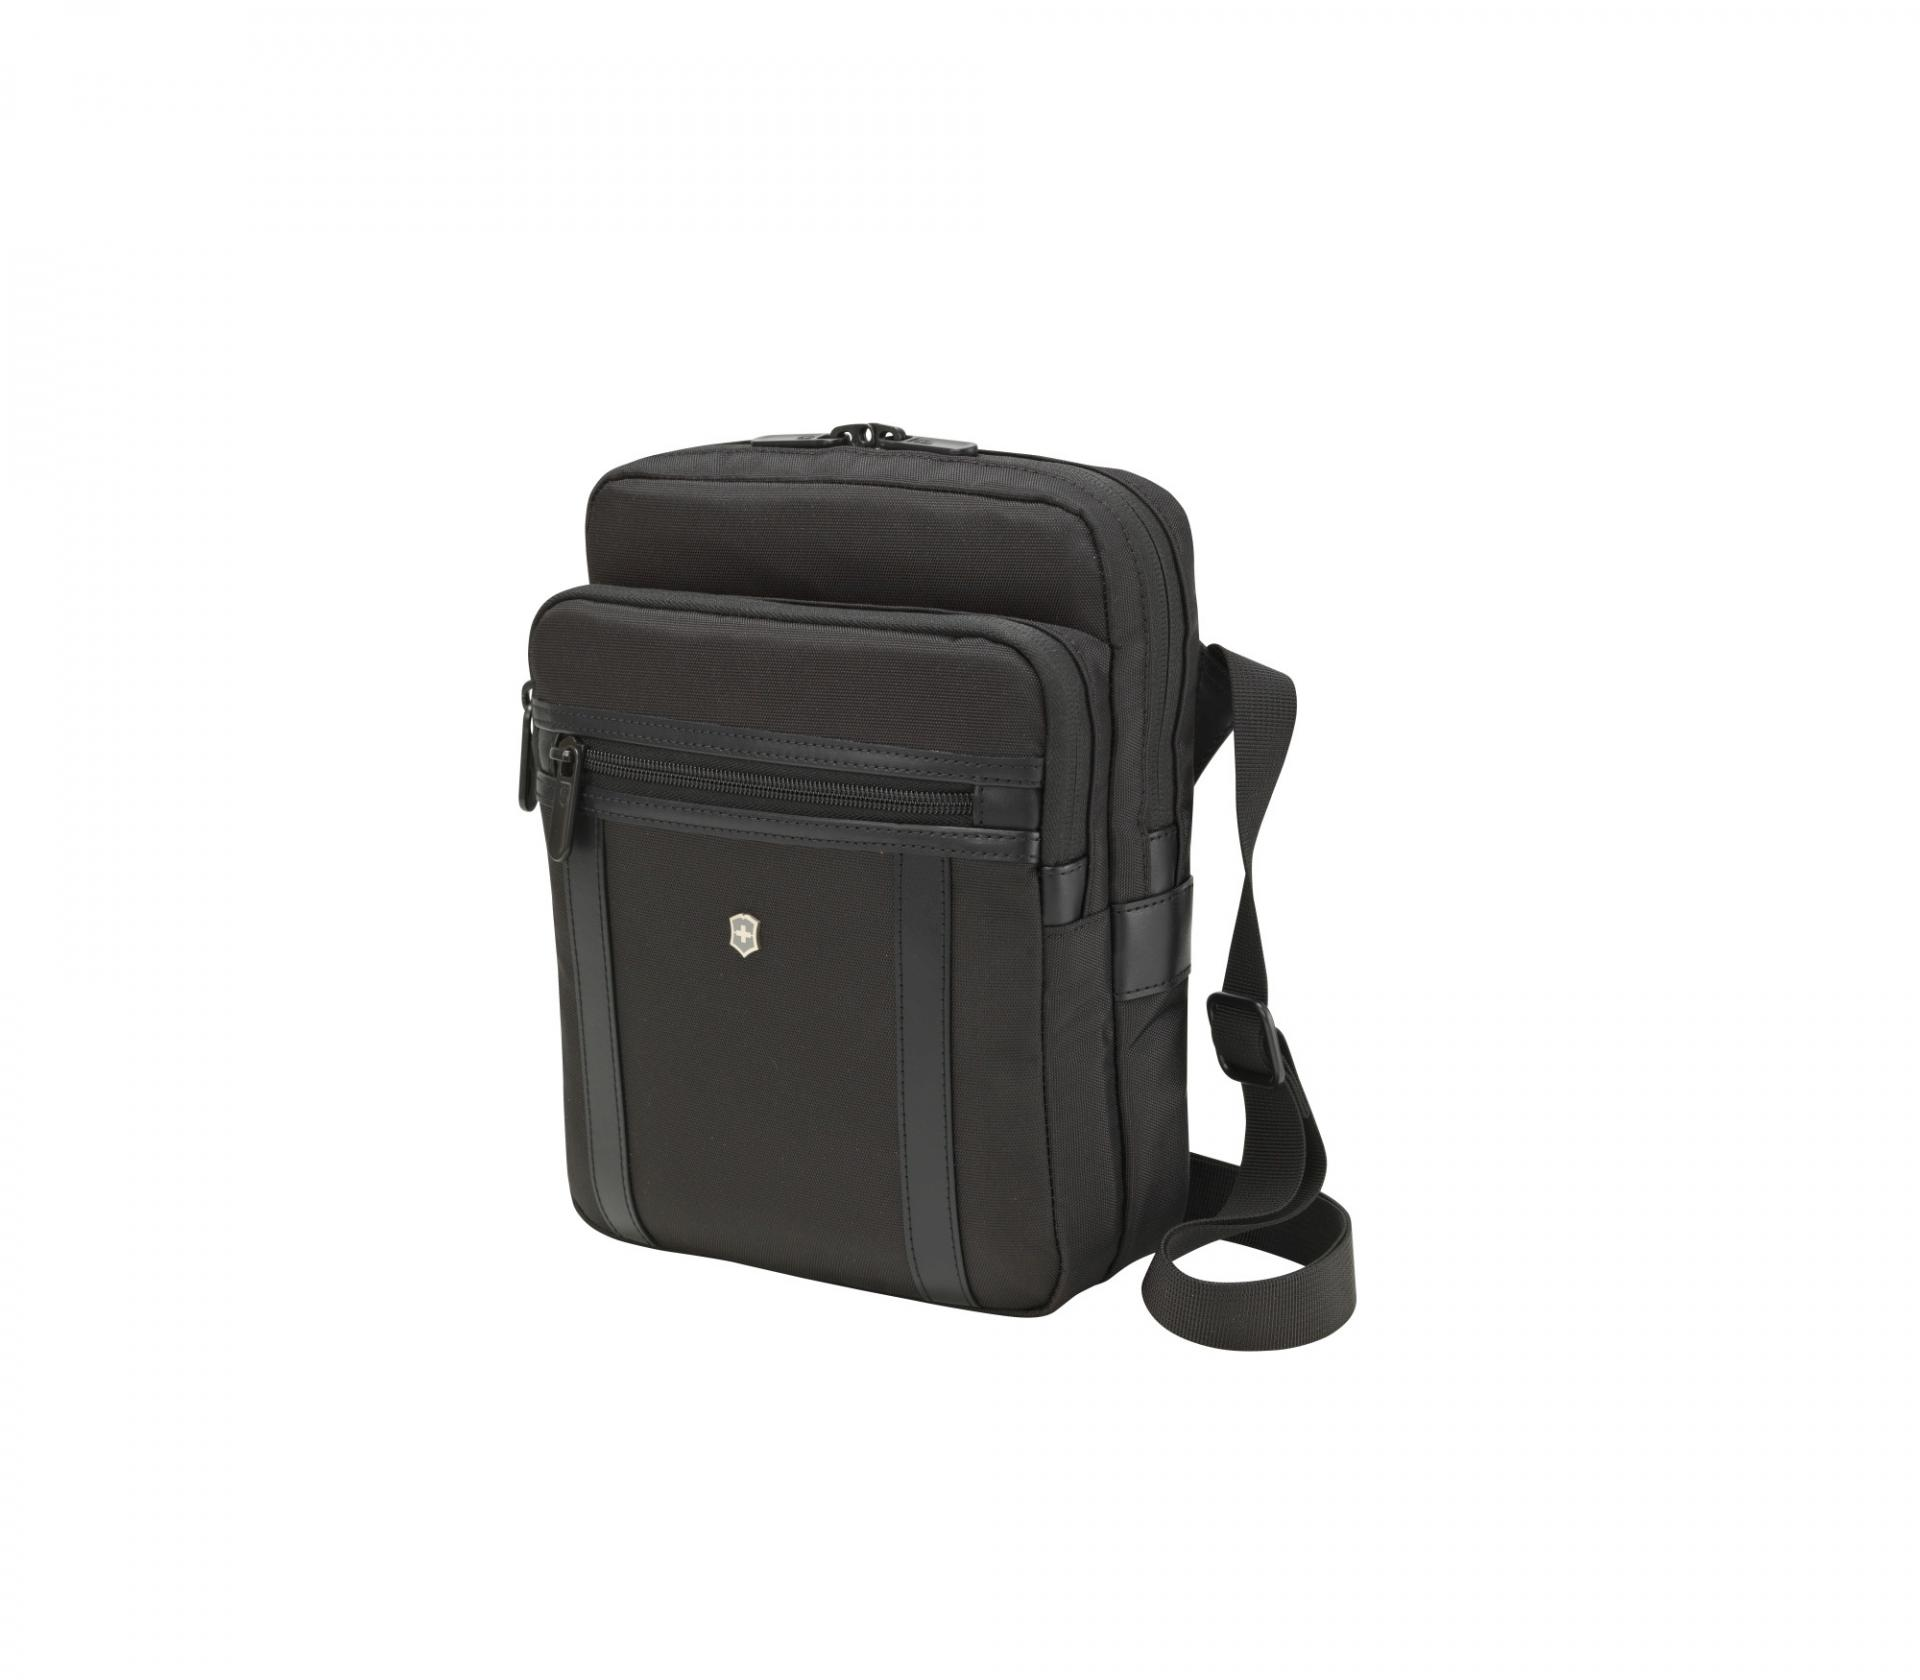 Bolso Victorinox Werks Professional 2.0, Crossbody Tablet Bag, Black 605327 *